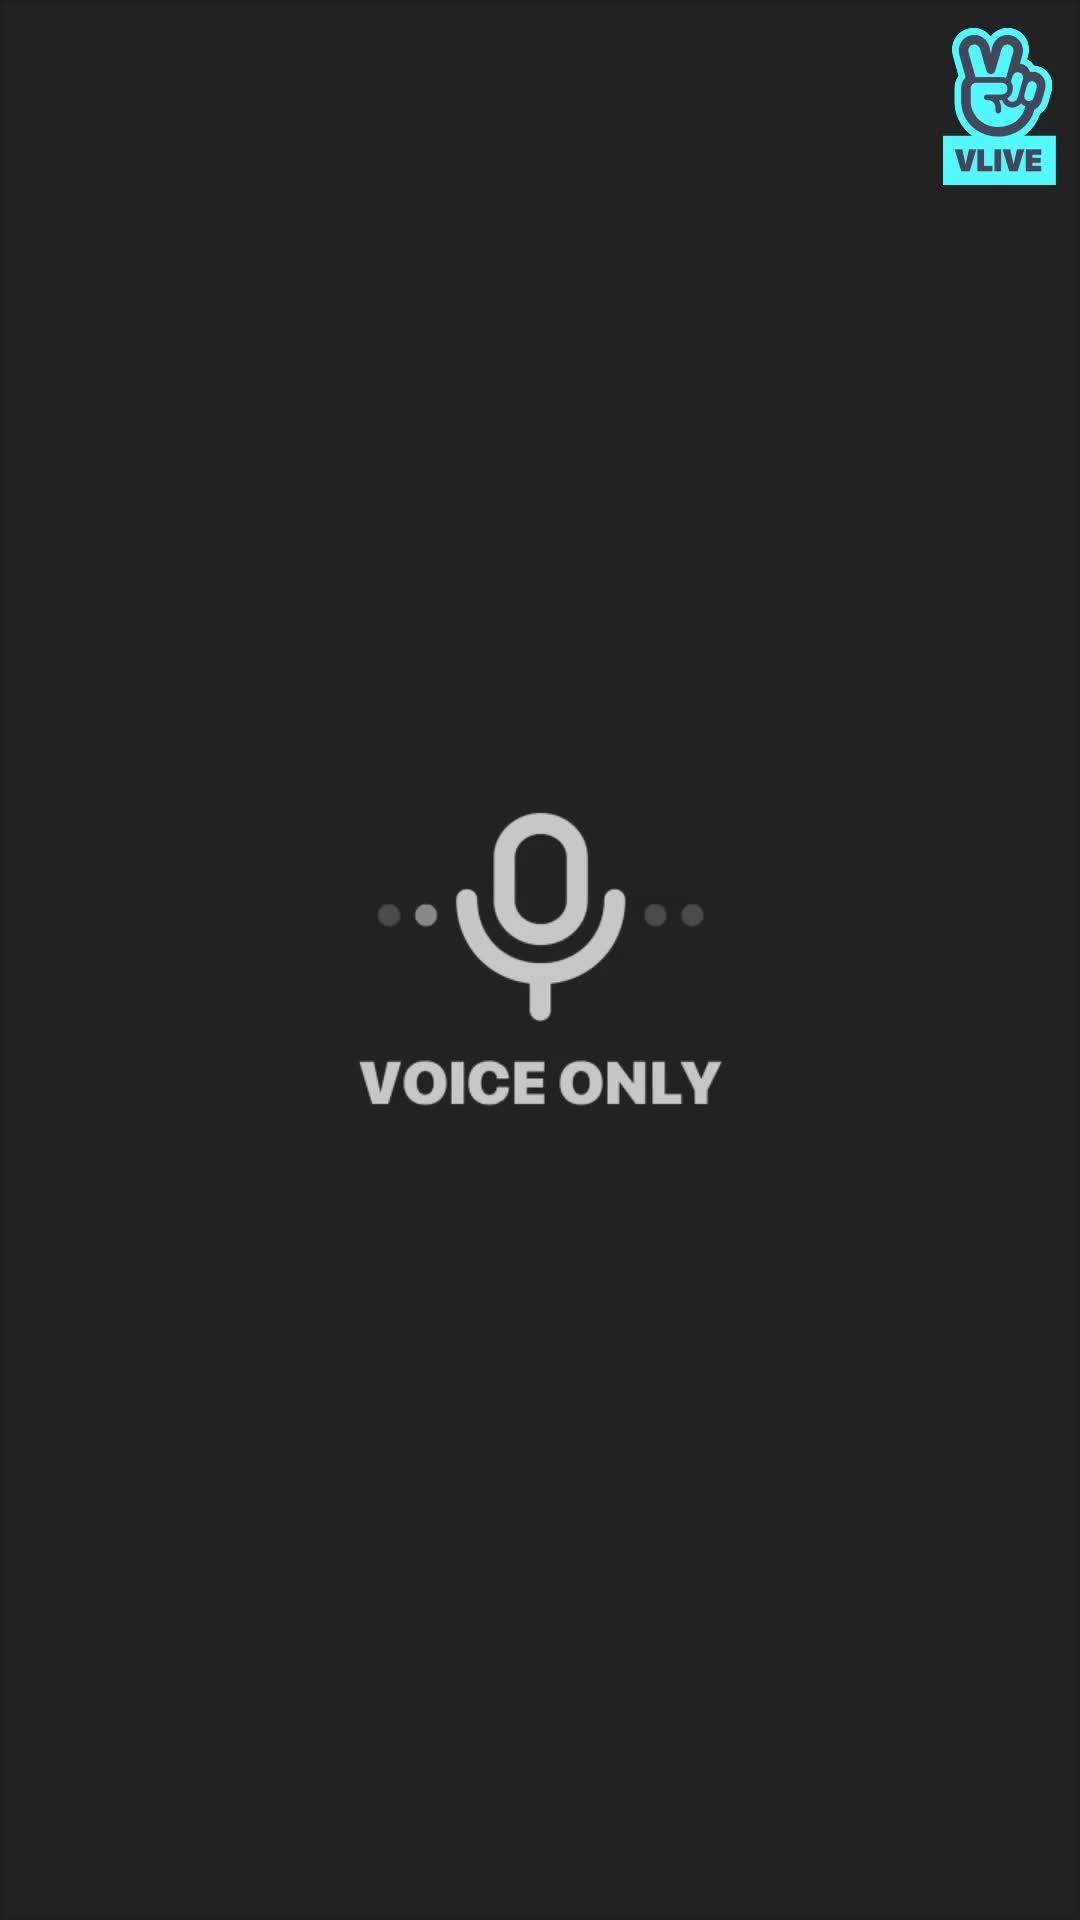 [RADIO] 캐럿들 귀대귀대 #68 정한이의 따뜻한 우유 한 잔